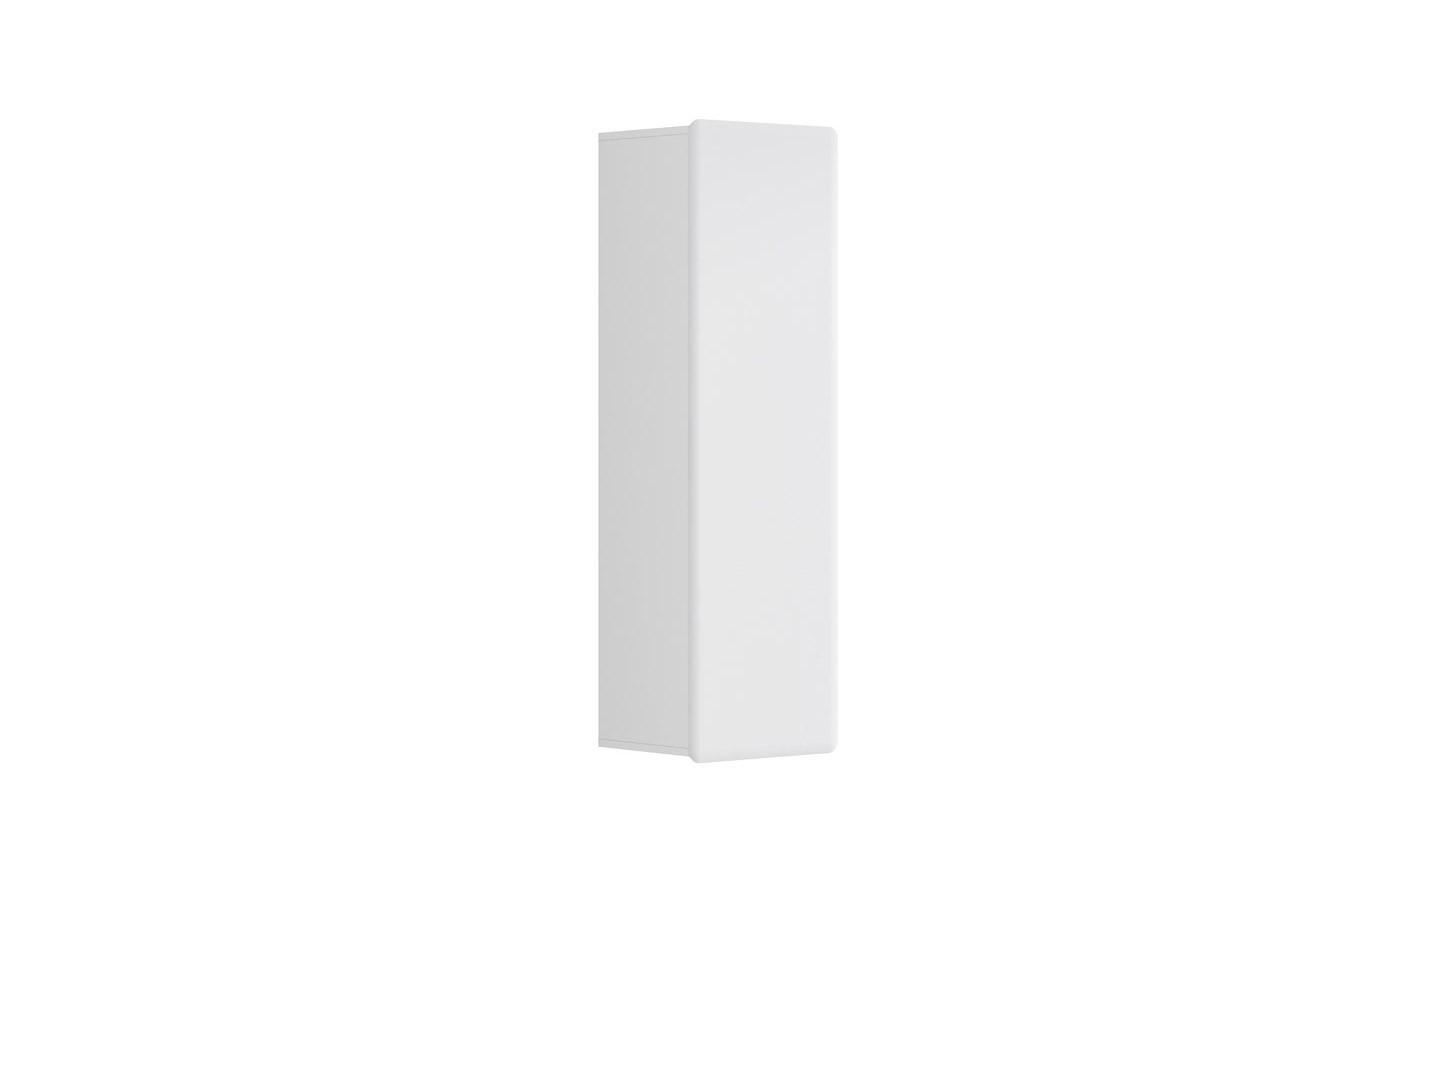 Skříňka na stěnu - BRW - Possi Light - SFW1D/13/4 (bílá + lesk bílý)